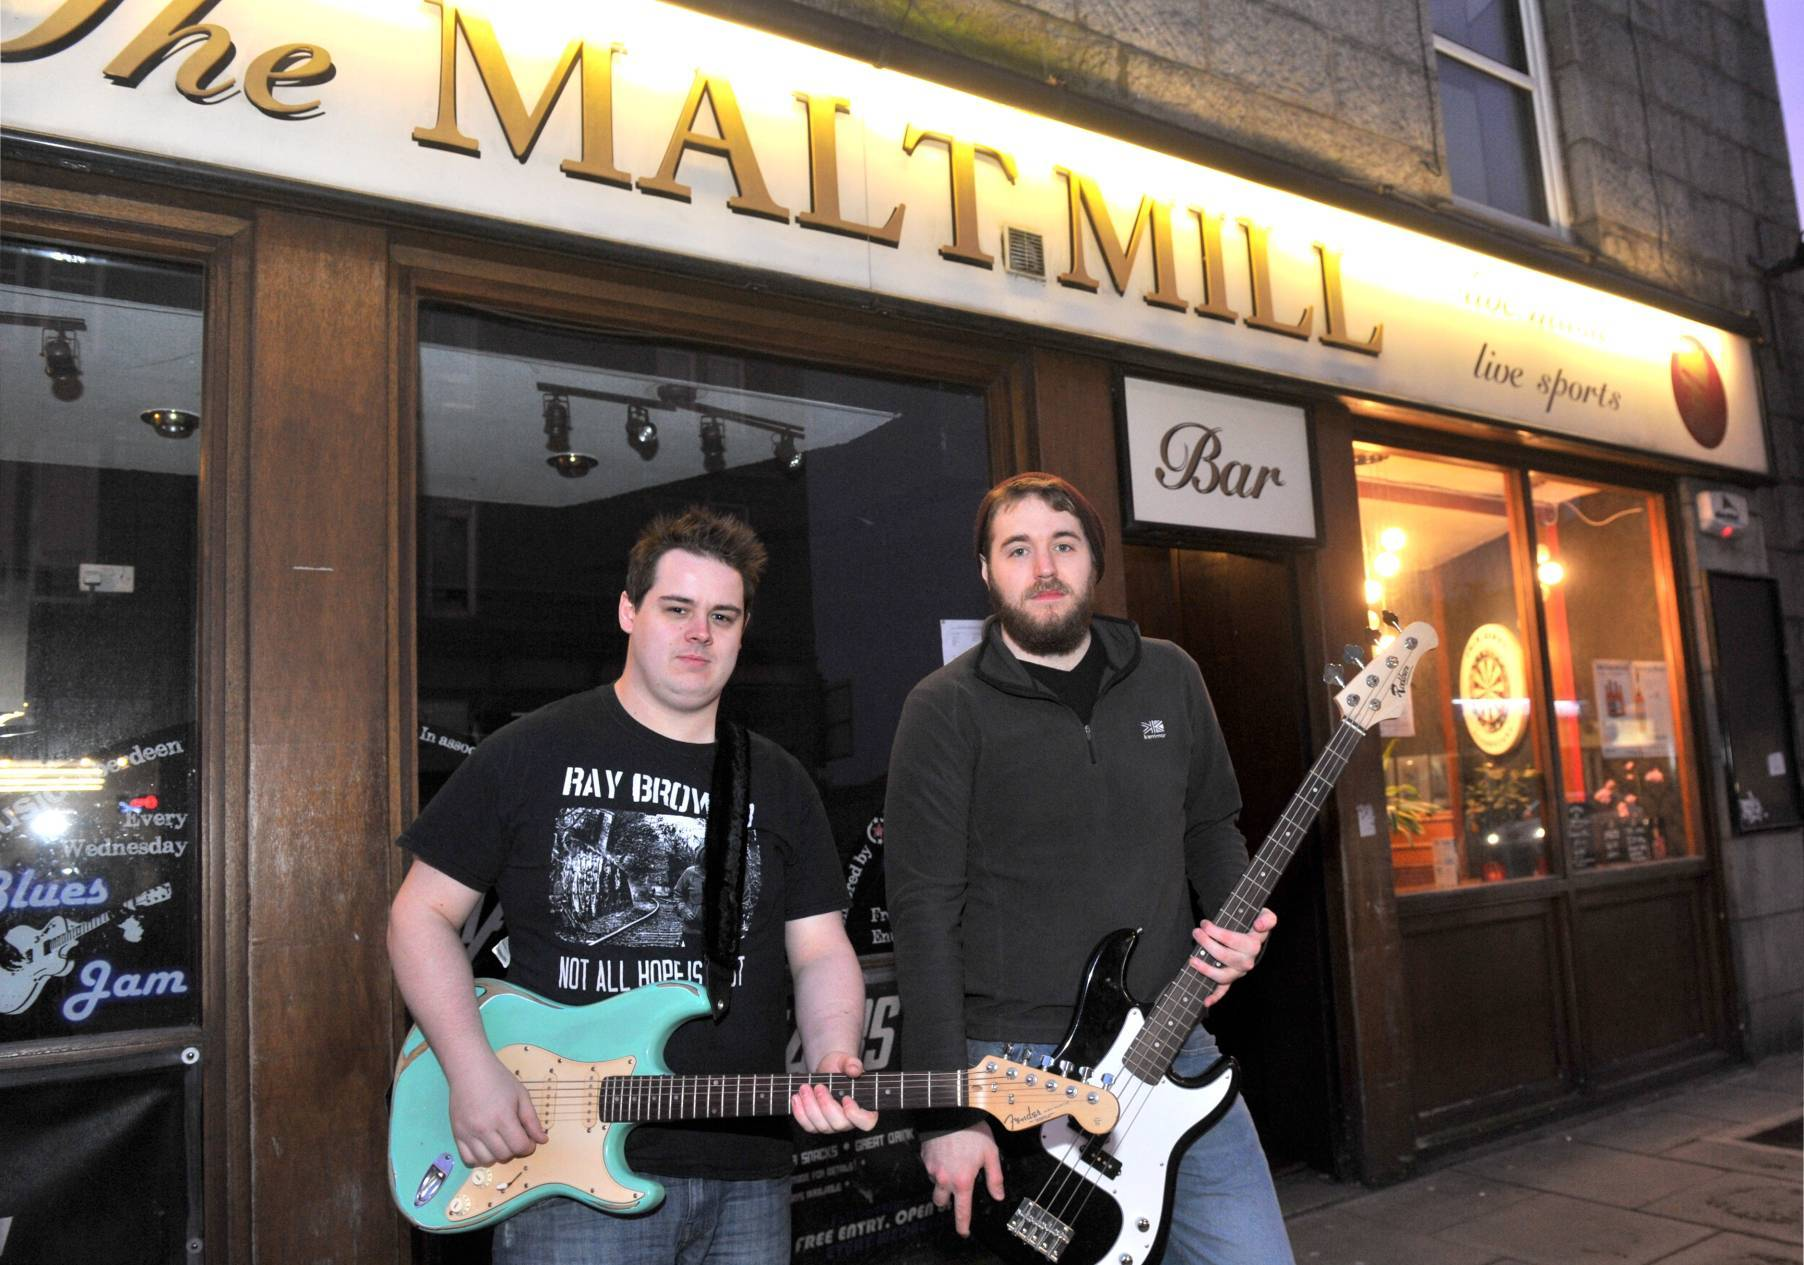 From left, Gavin Bassett and David McGhie.